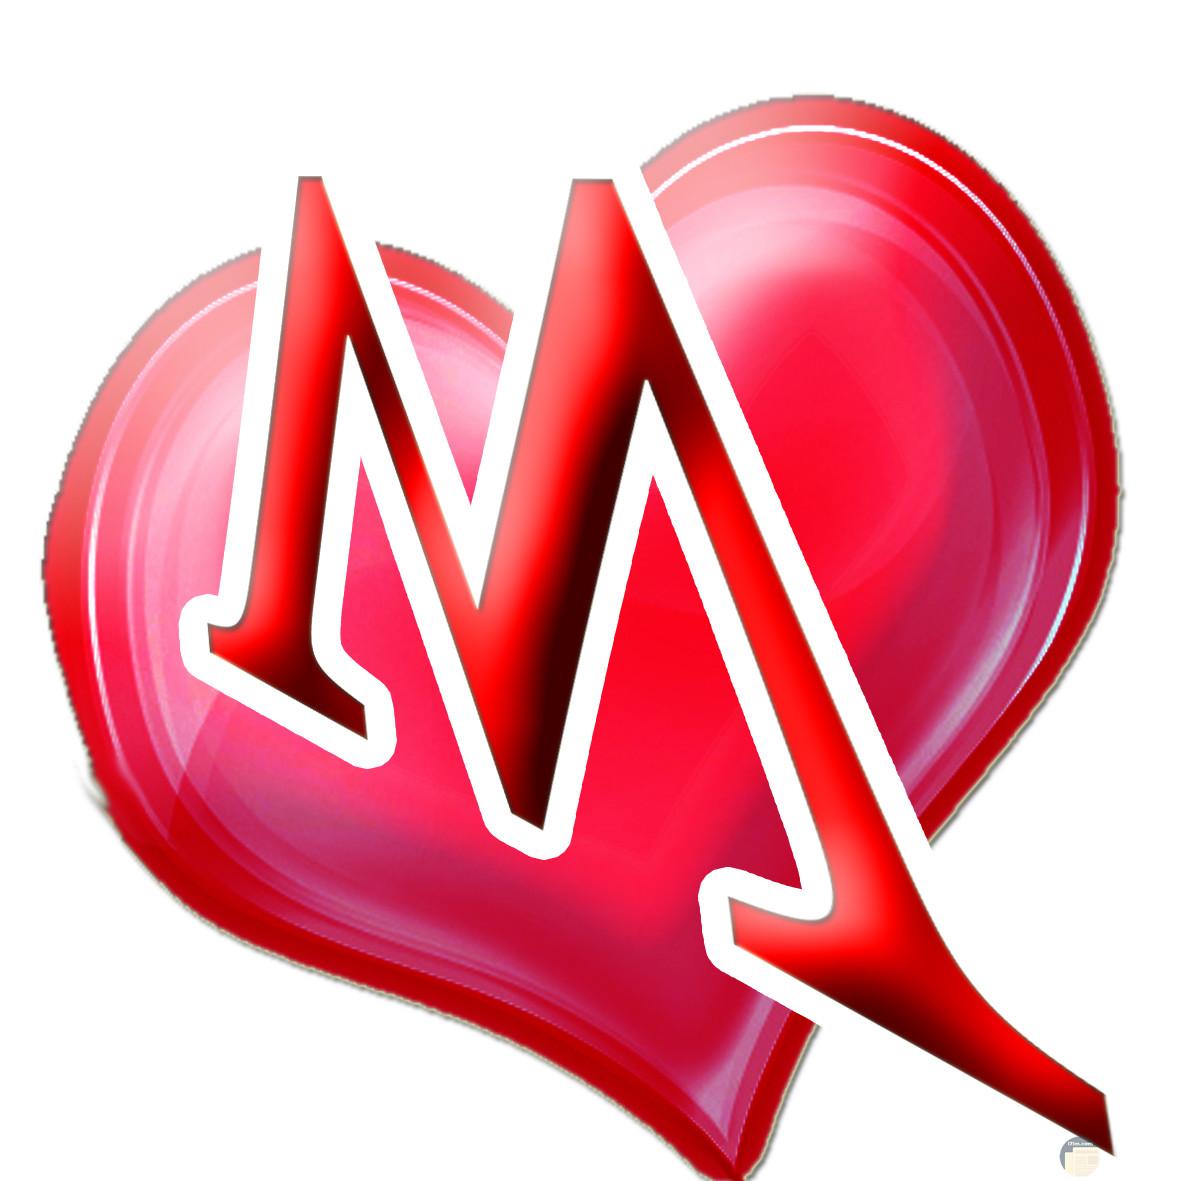 حرف m بداخل قلب أحمر